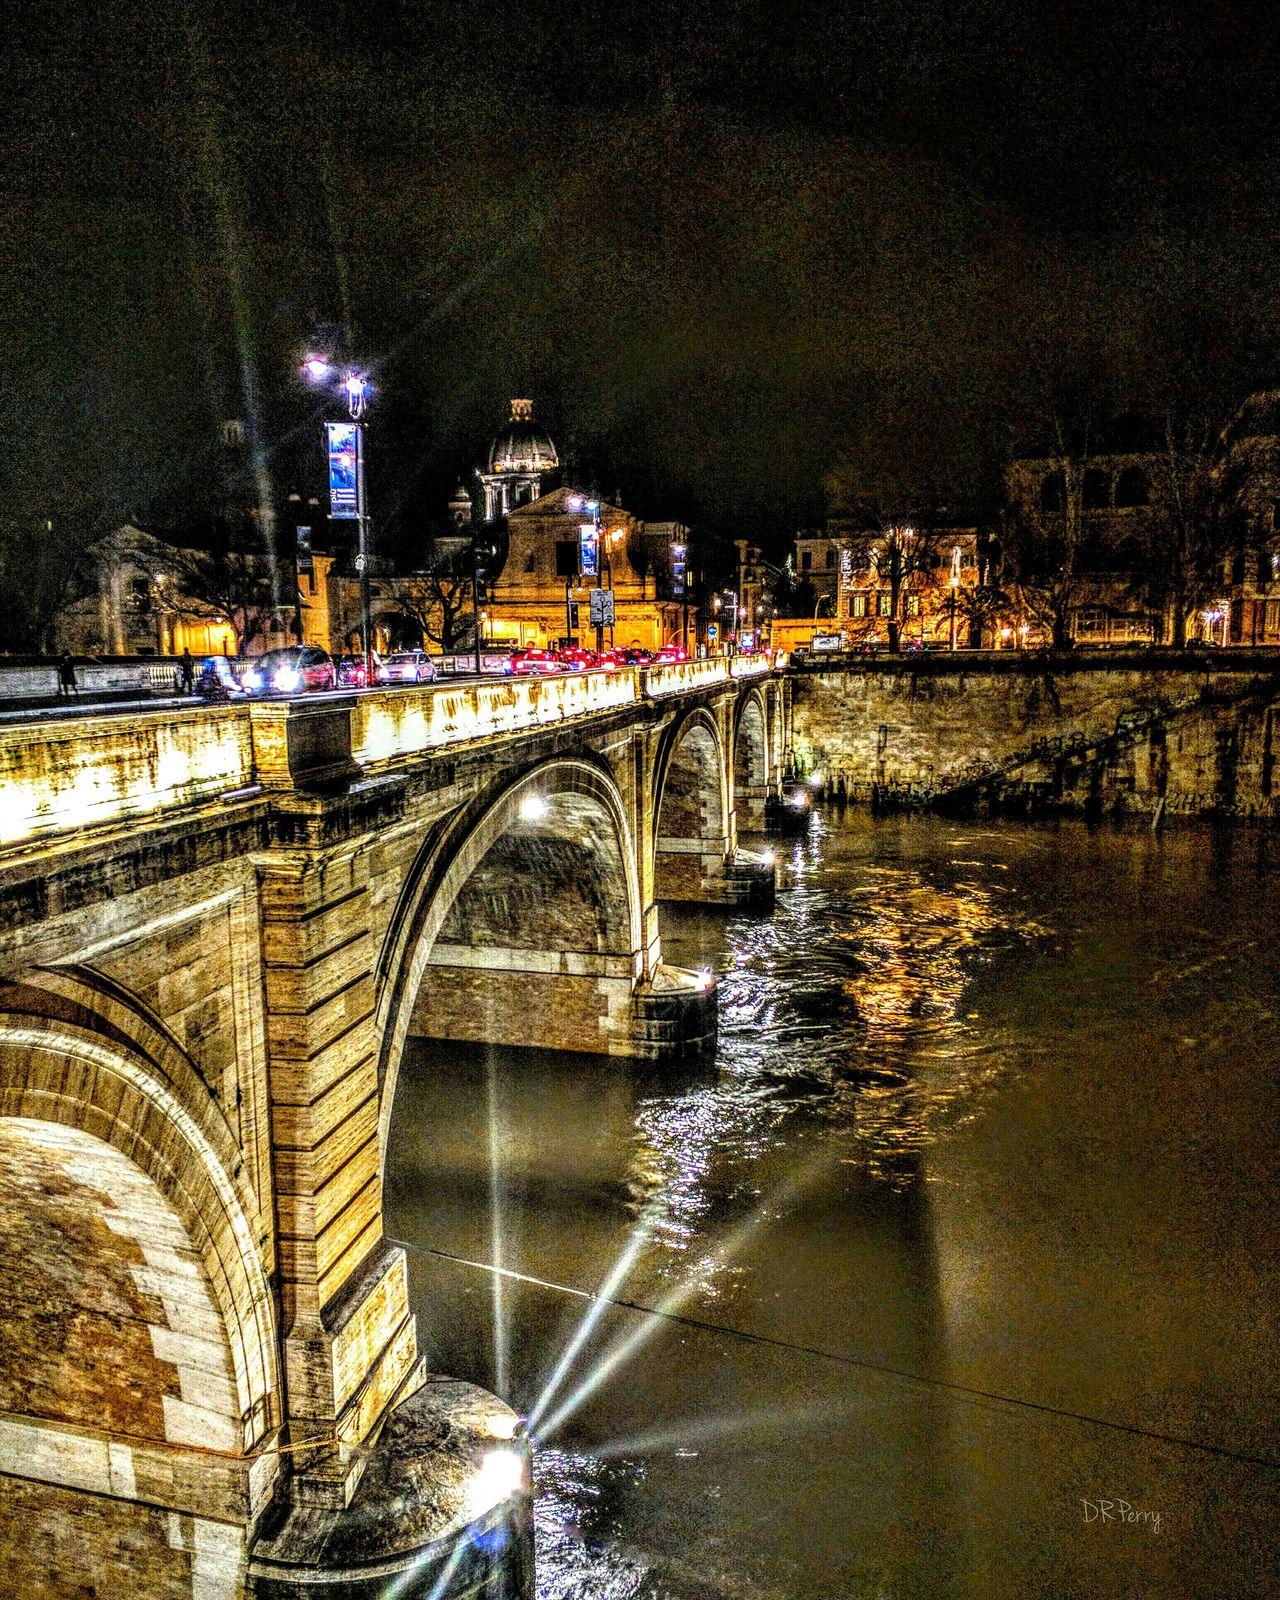 Pontecavour Rome Roma Italy Italia Bridge Ponte Vecchio Bridgesaroundtheworld Bridge View Photobydperry